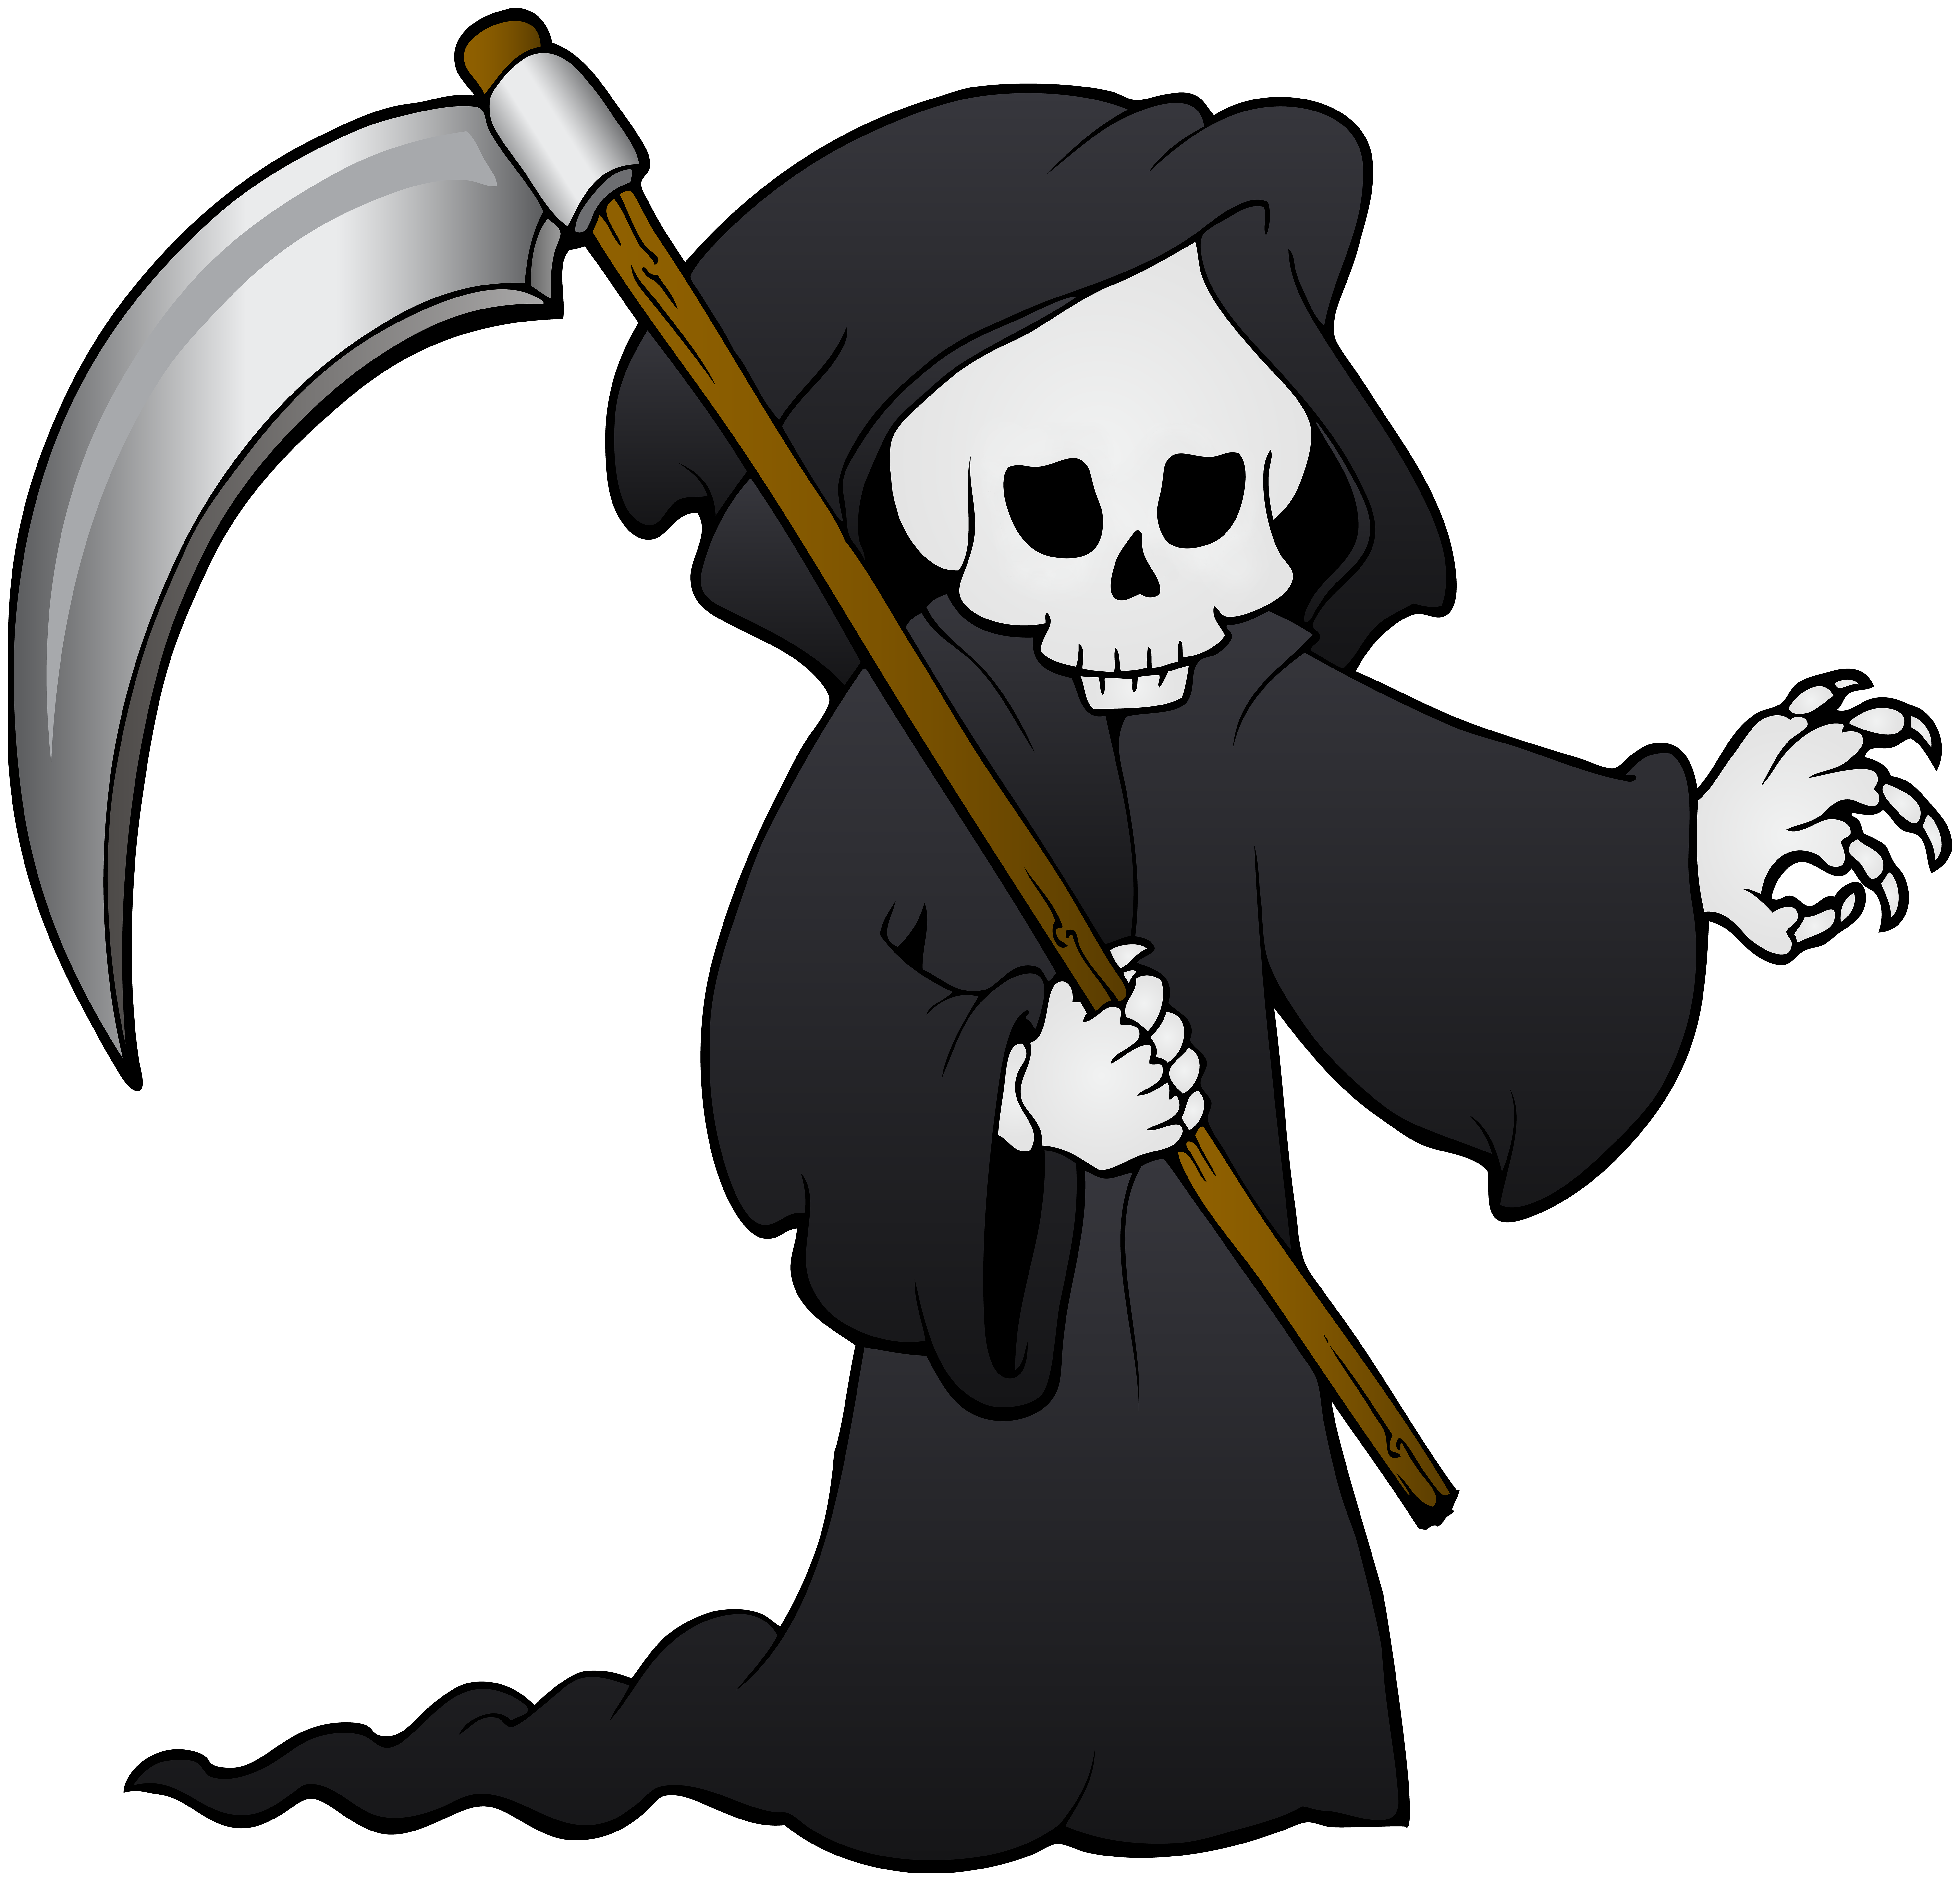 Grim Reaper PNG Clip Art Image.